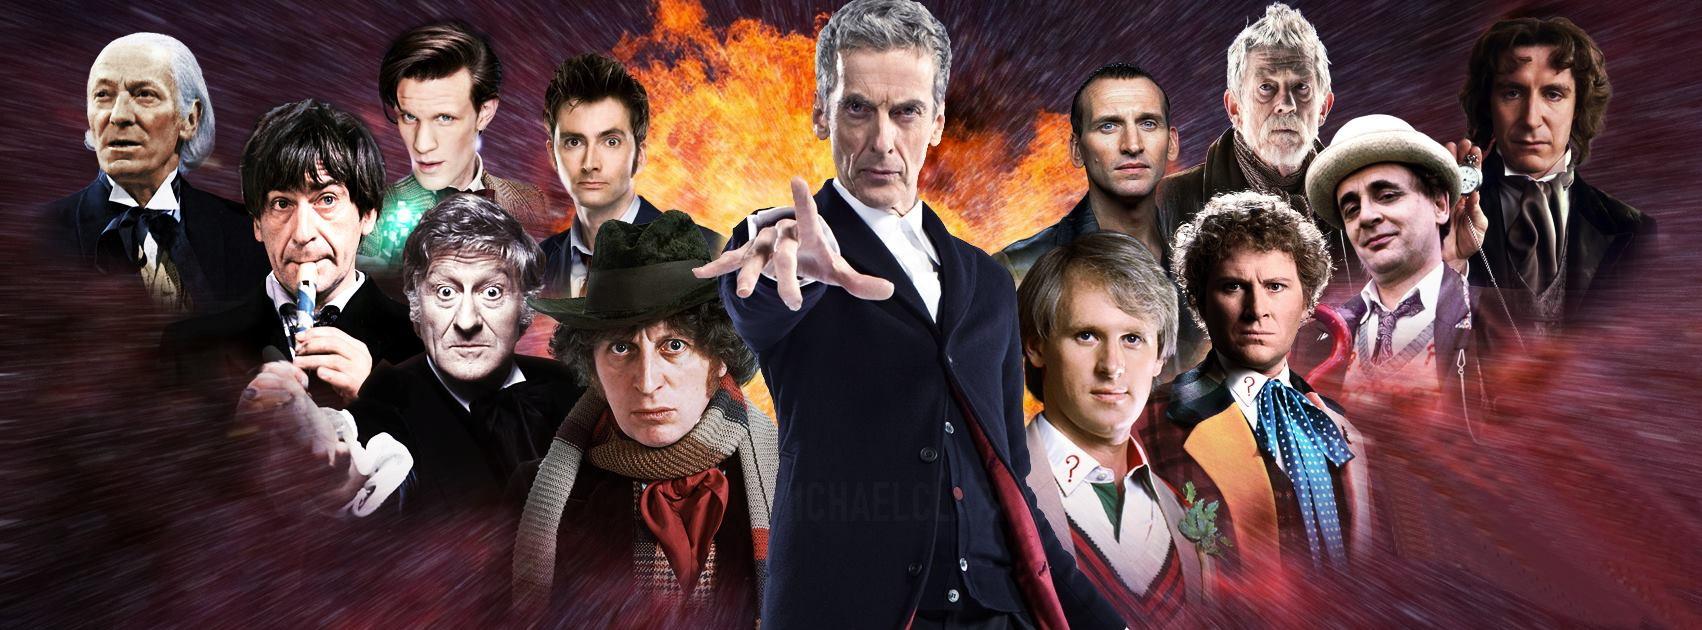 Regeneration of the Doctor | Do Góry | 1702 x 630 jpeg 256kB